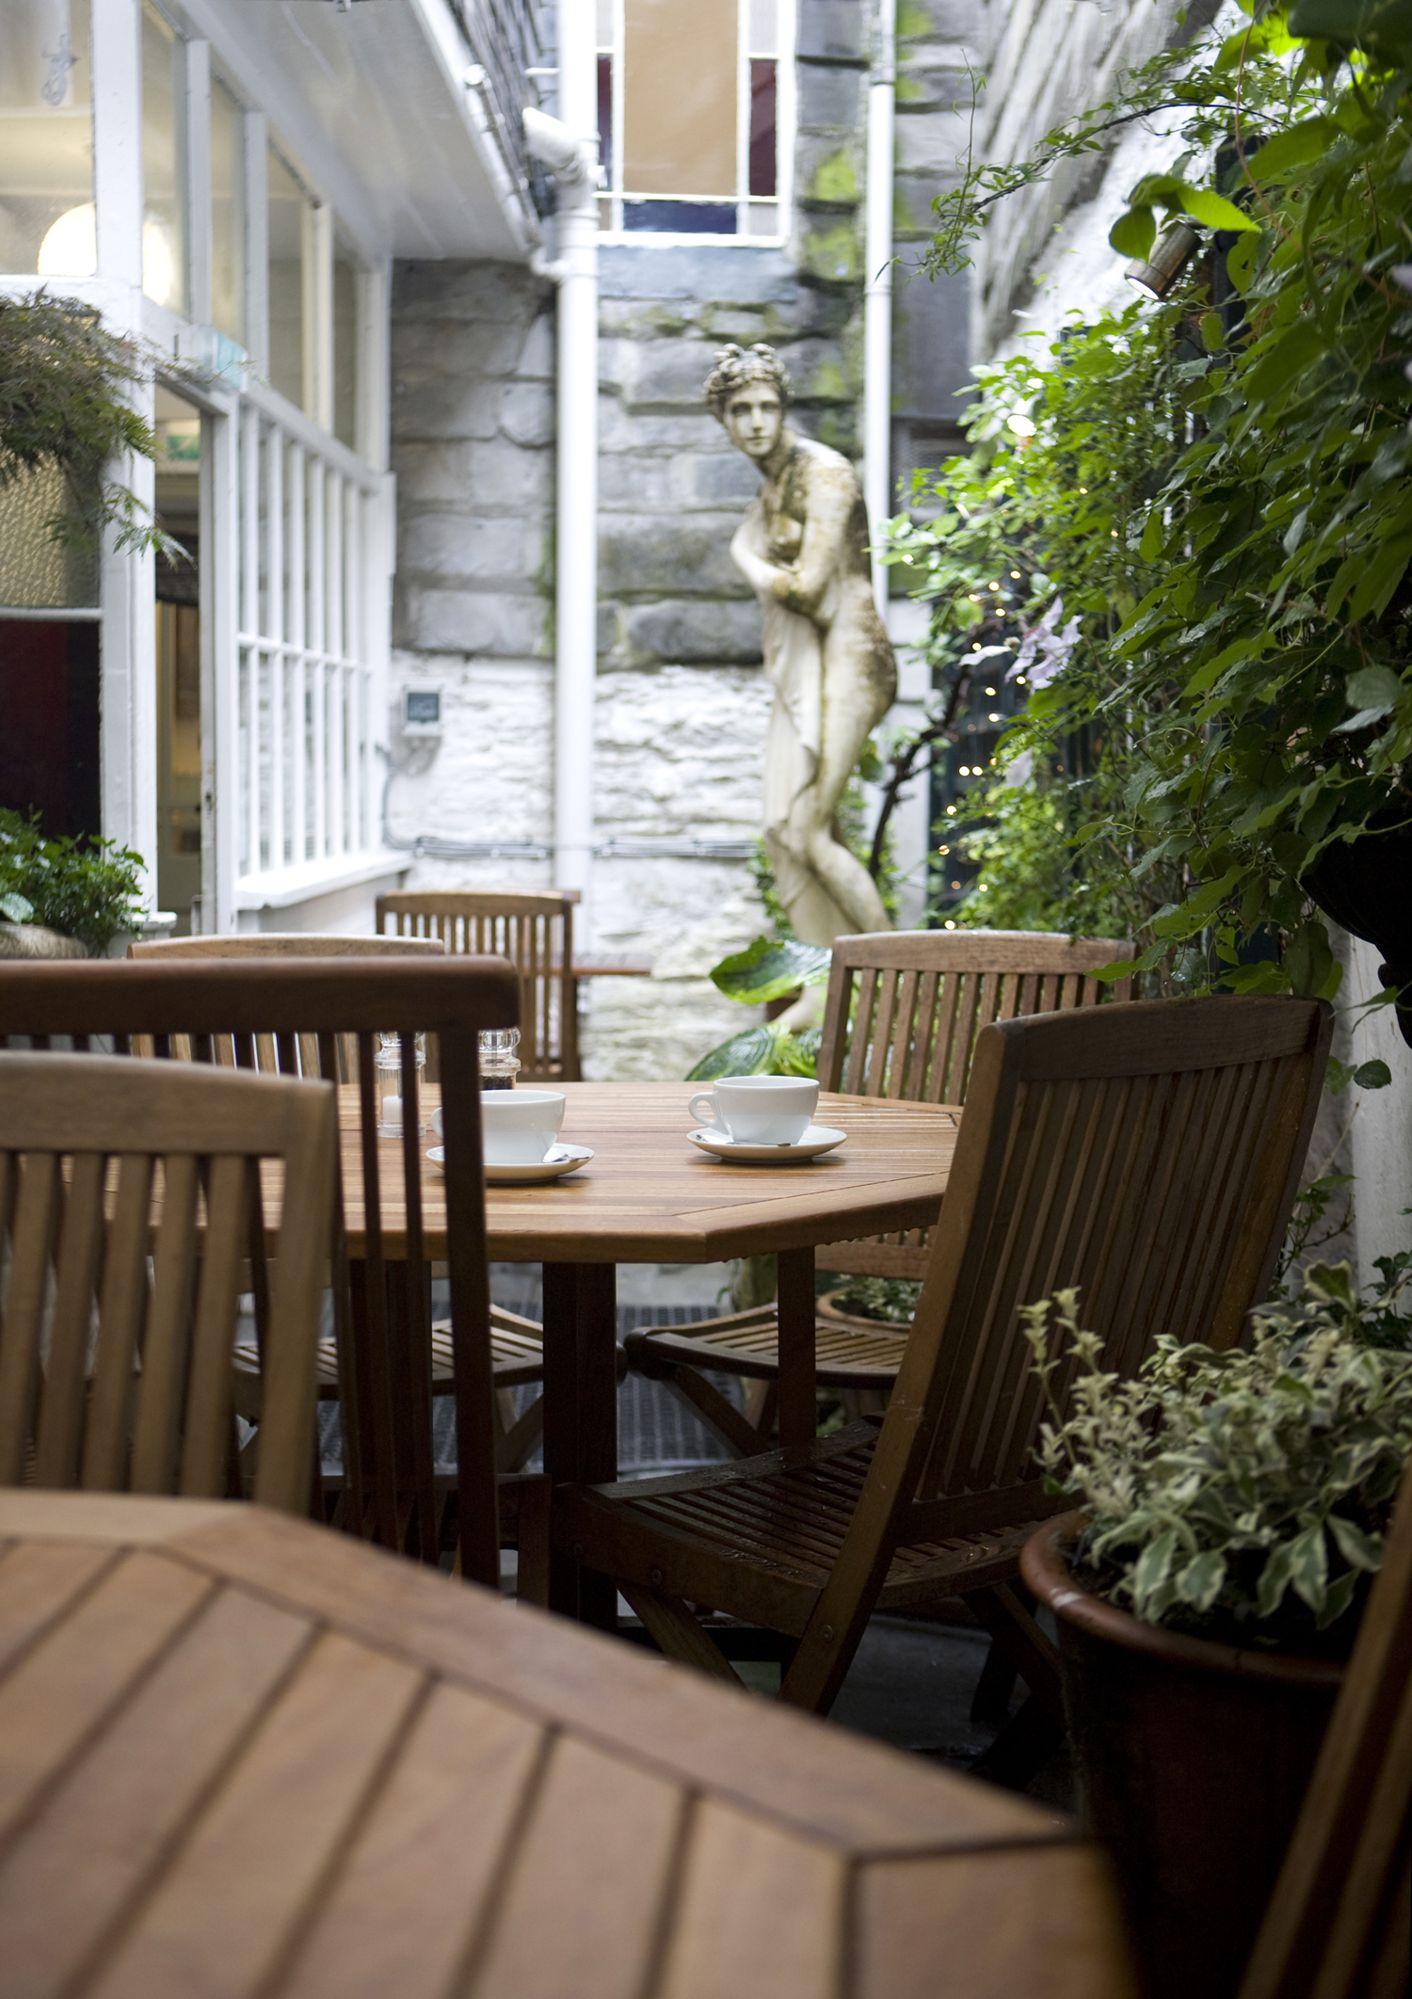 Rick Stein's Café Rooms